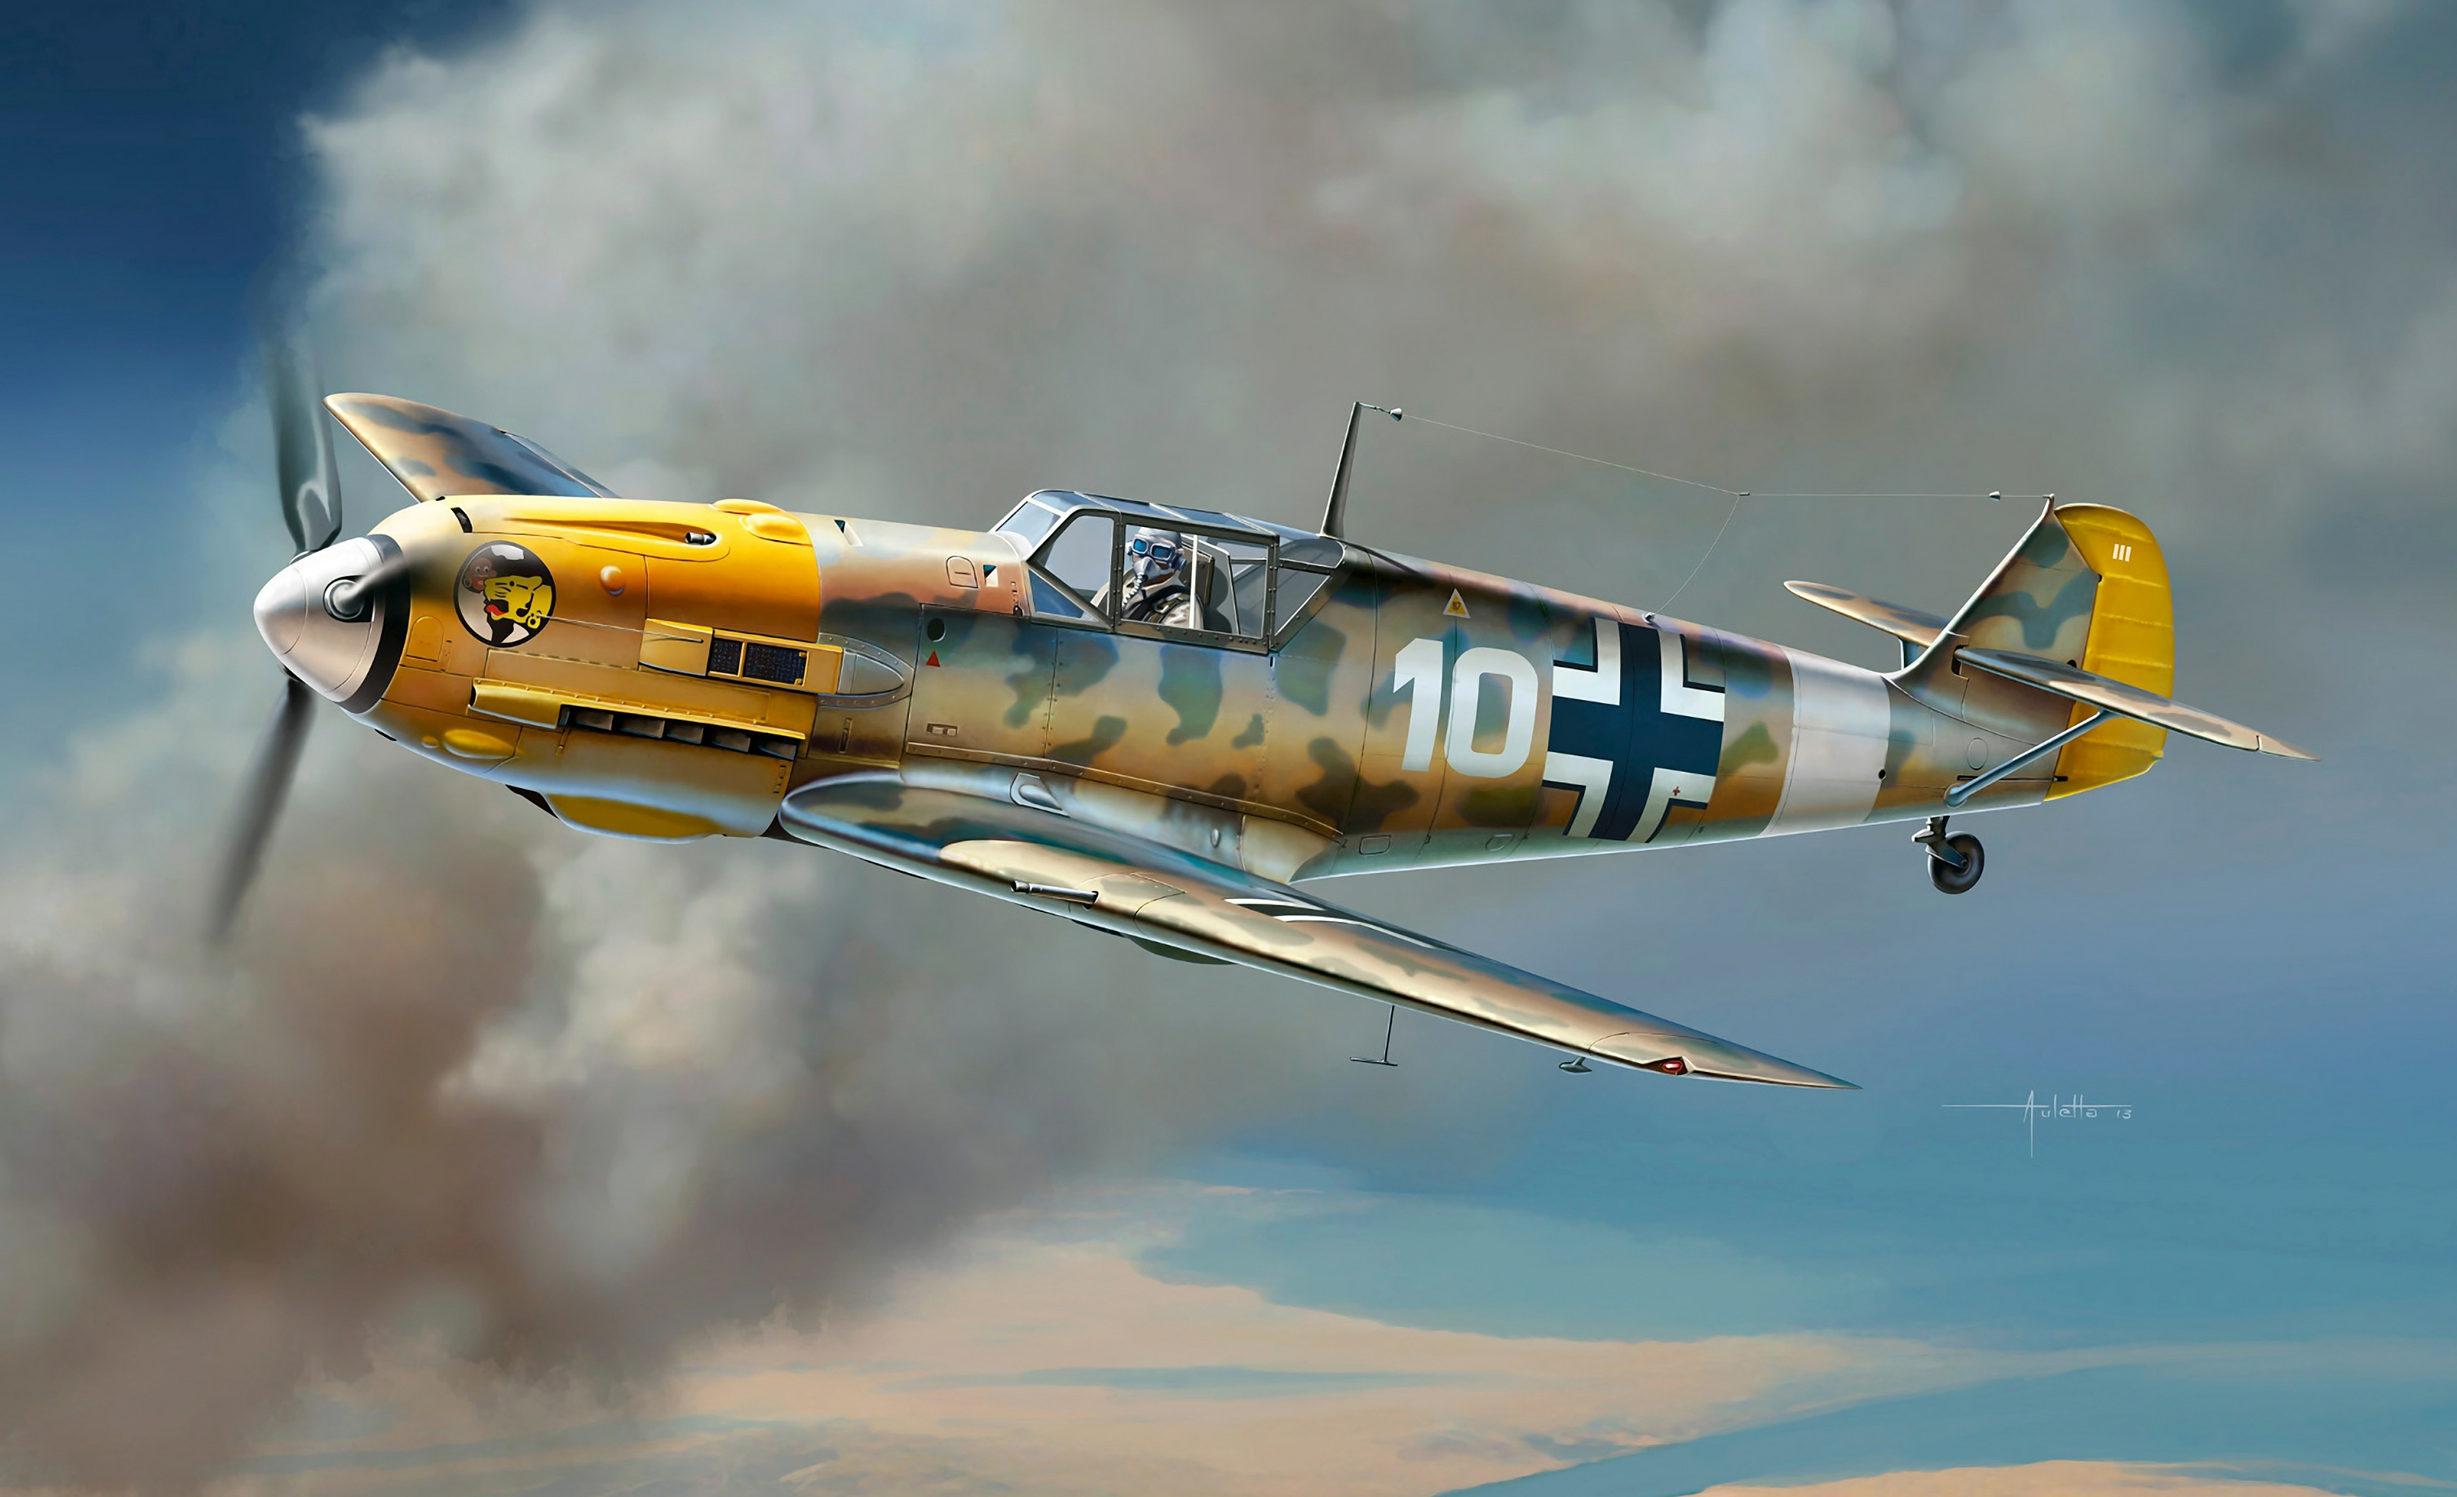 Auletta Vincenzo. Истребитель Bf-109 E-7 Tropical Version.